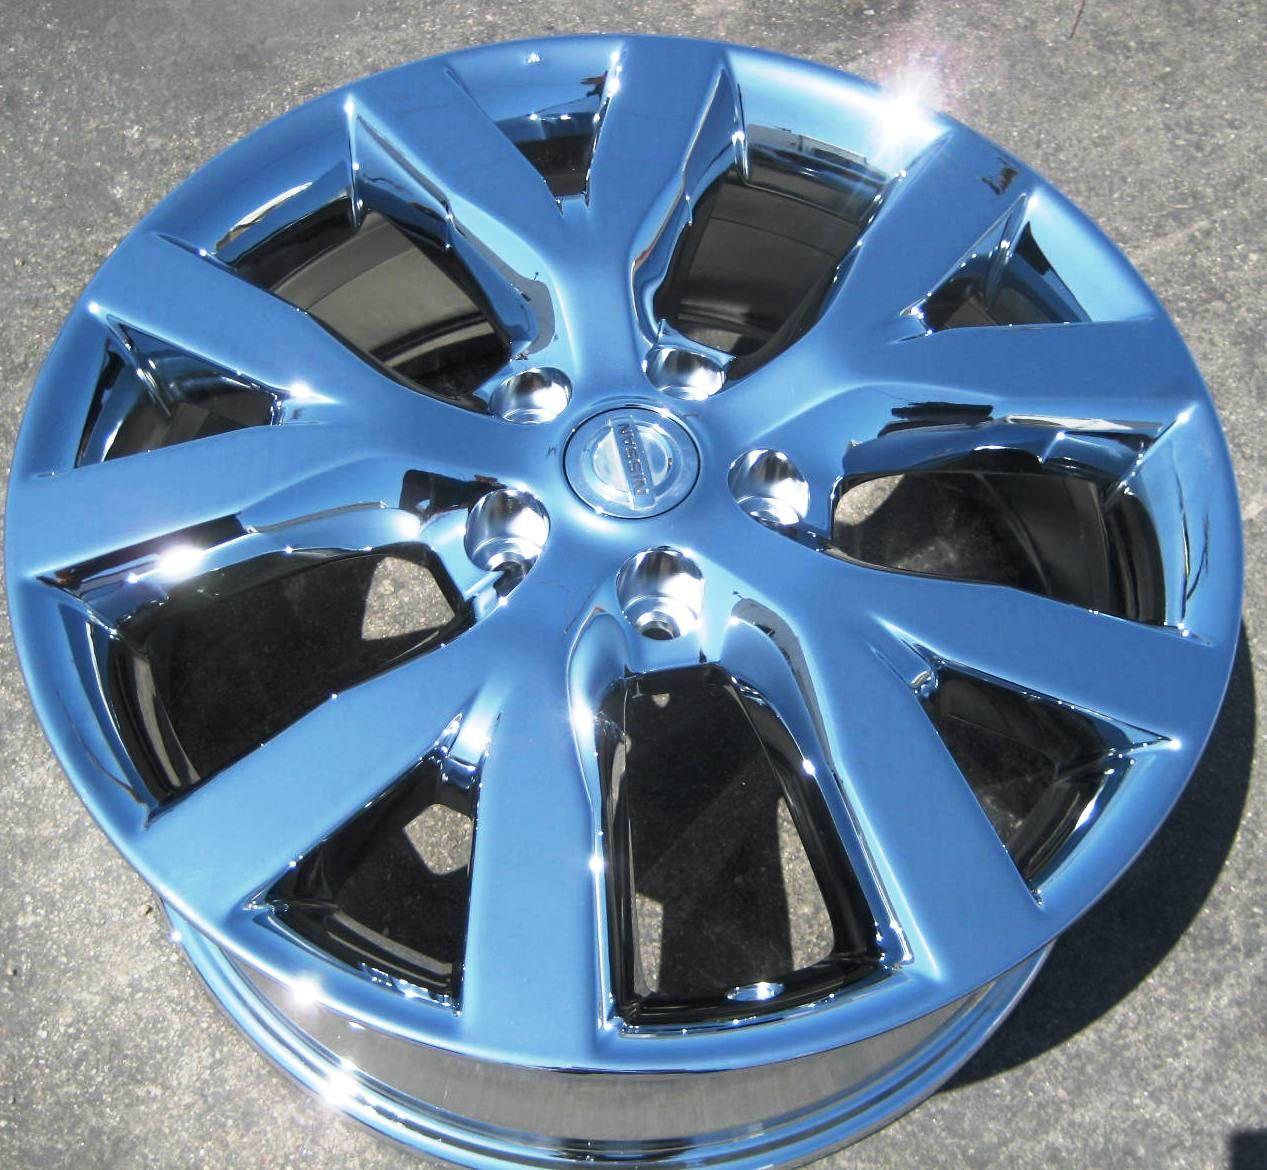 FACTORY NISSAN MURANO OEM CHROME WHEELS RIMS FX35 FX45 MAXIMA M45 M35